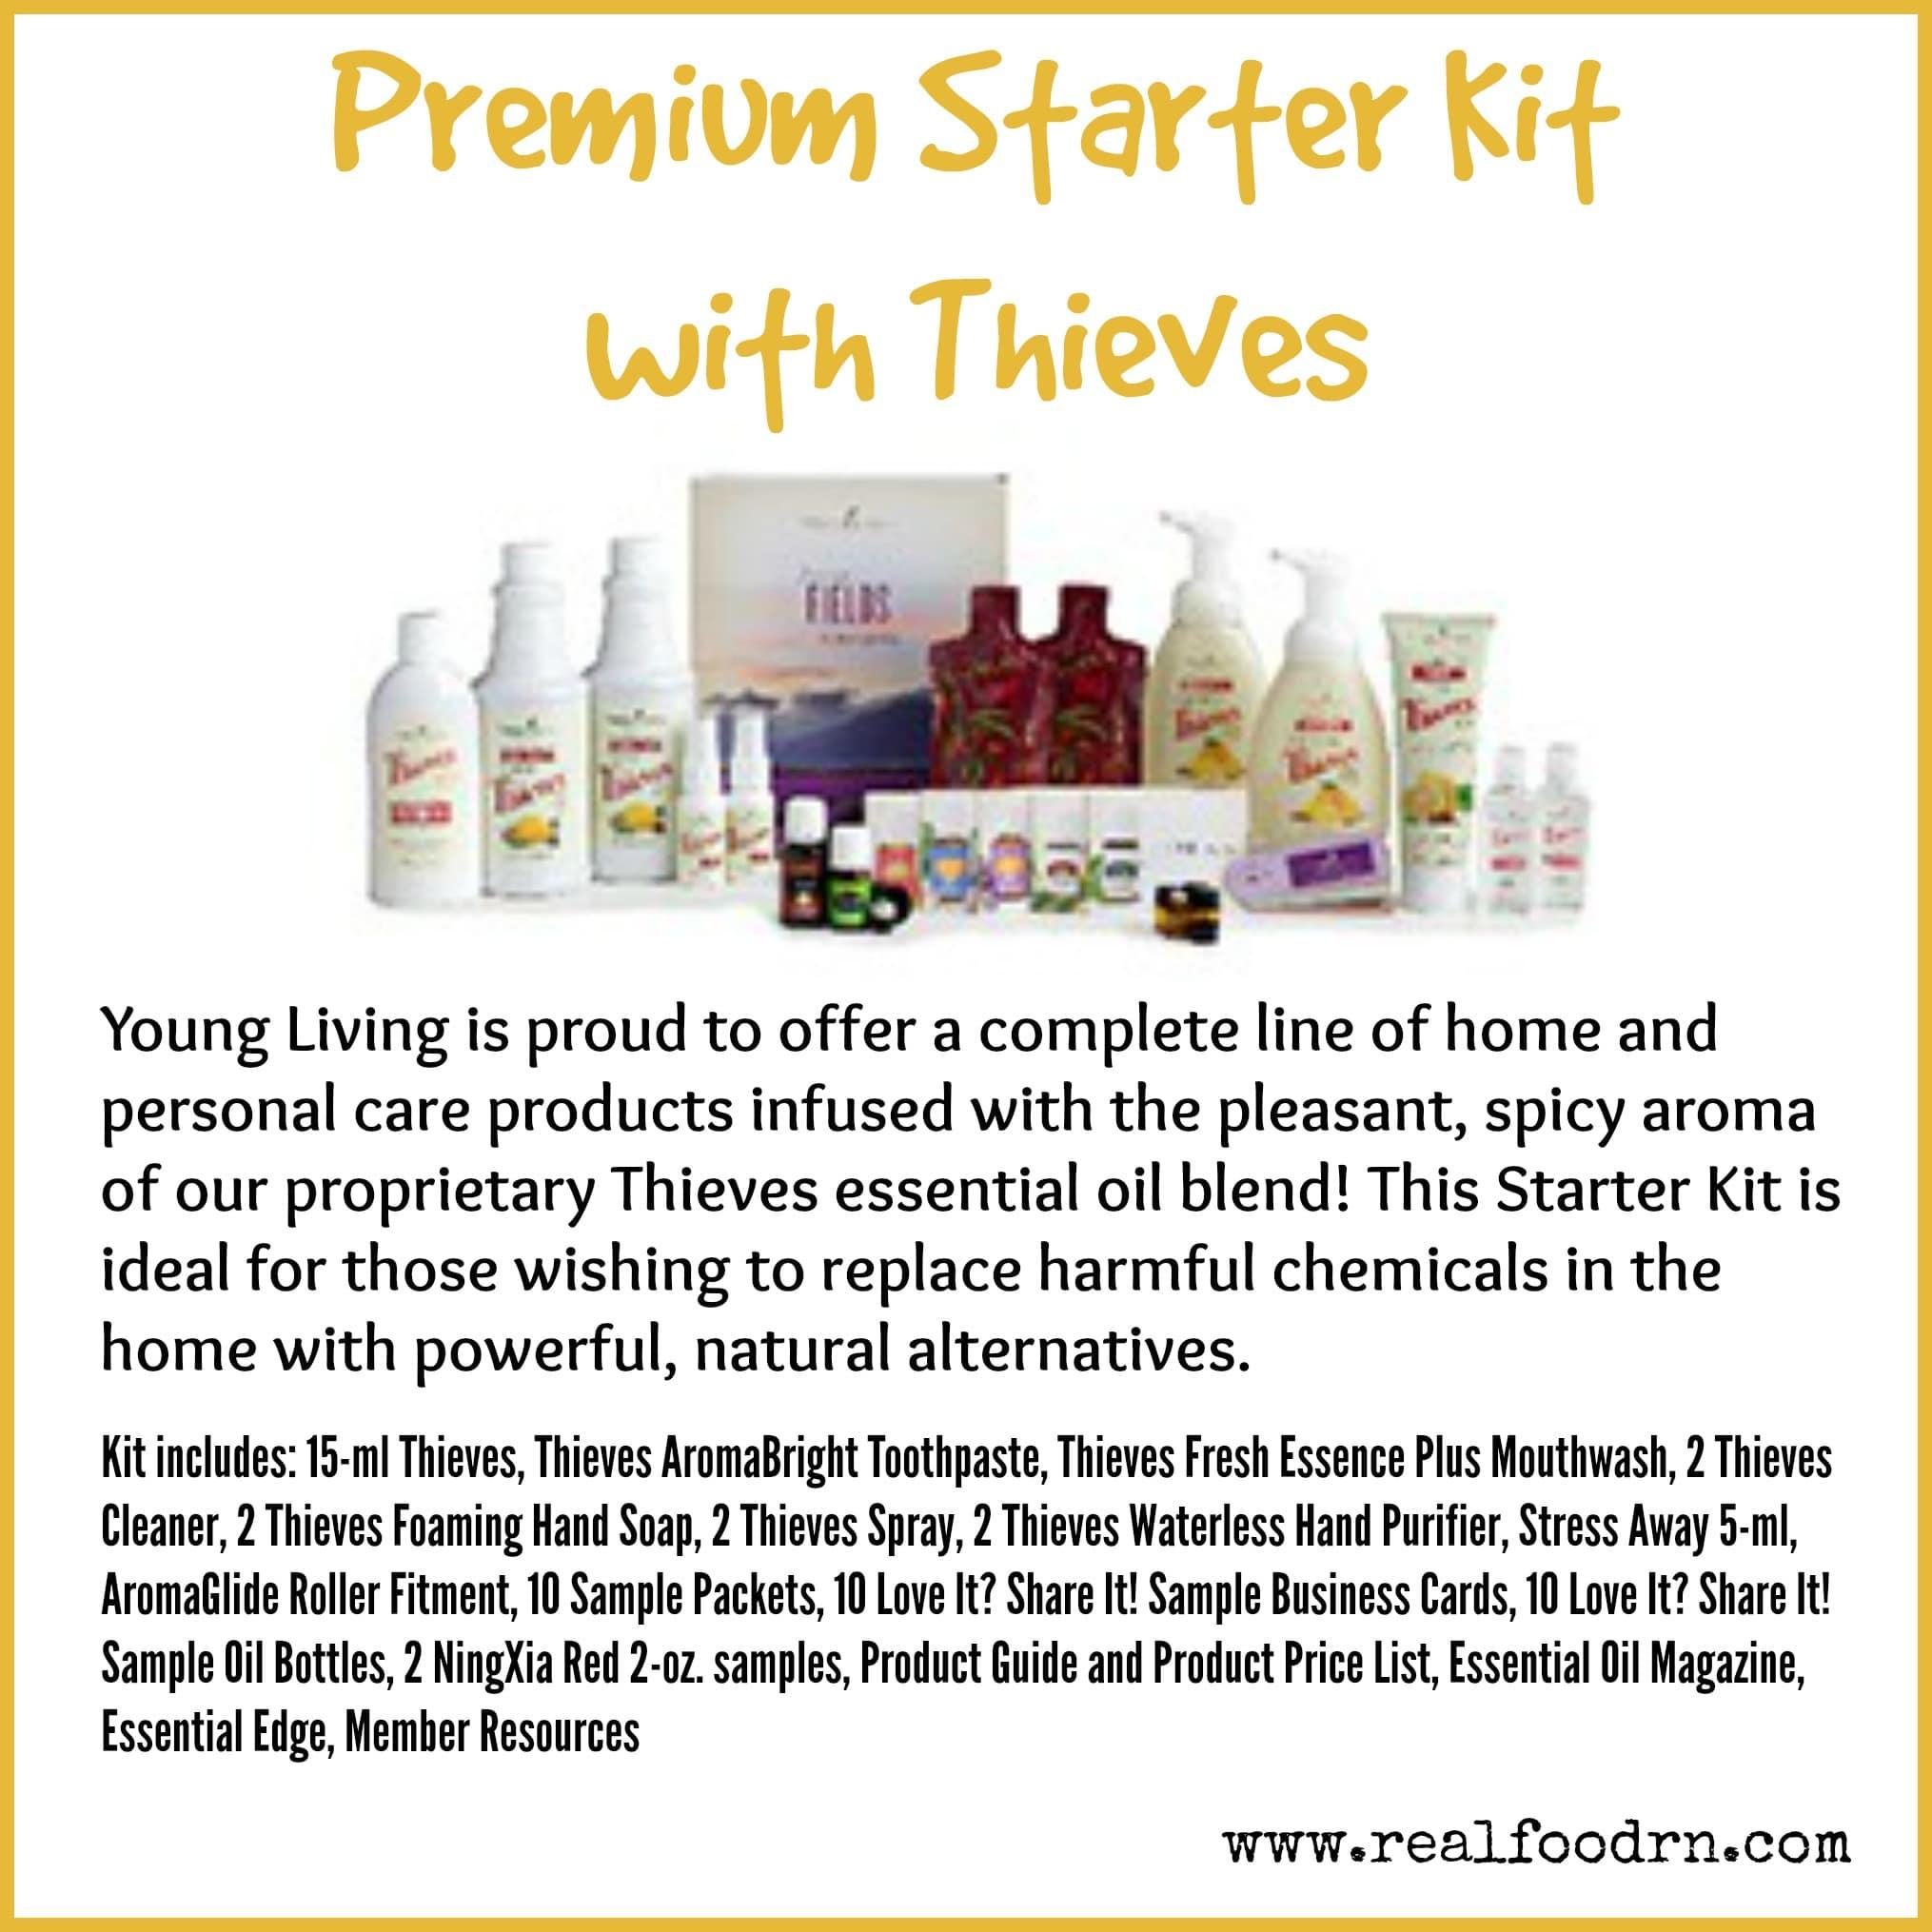 Premium Starter Kit with Thieves